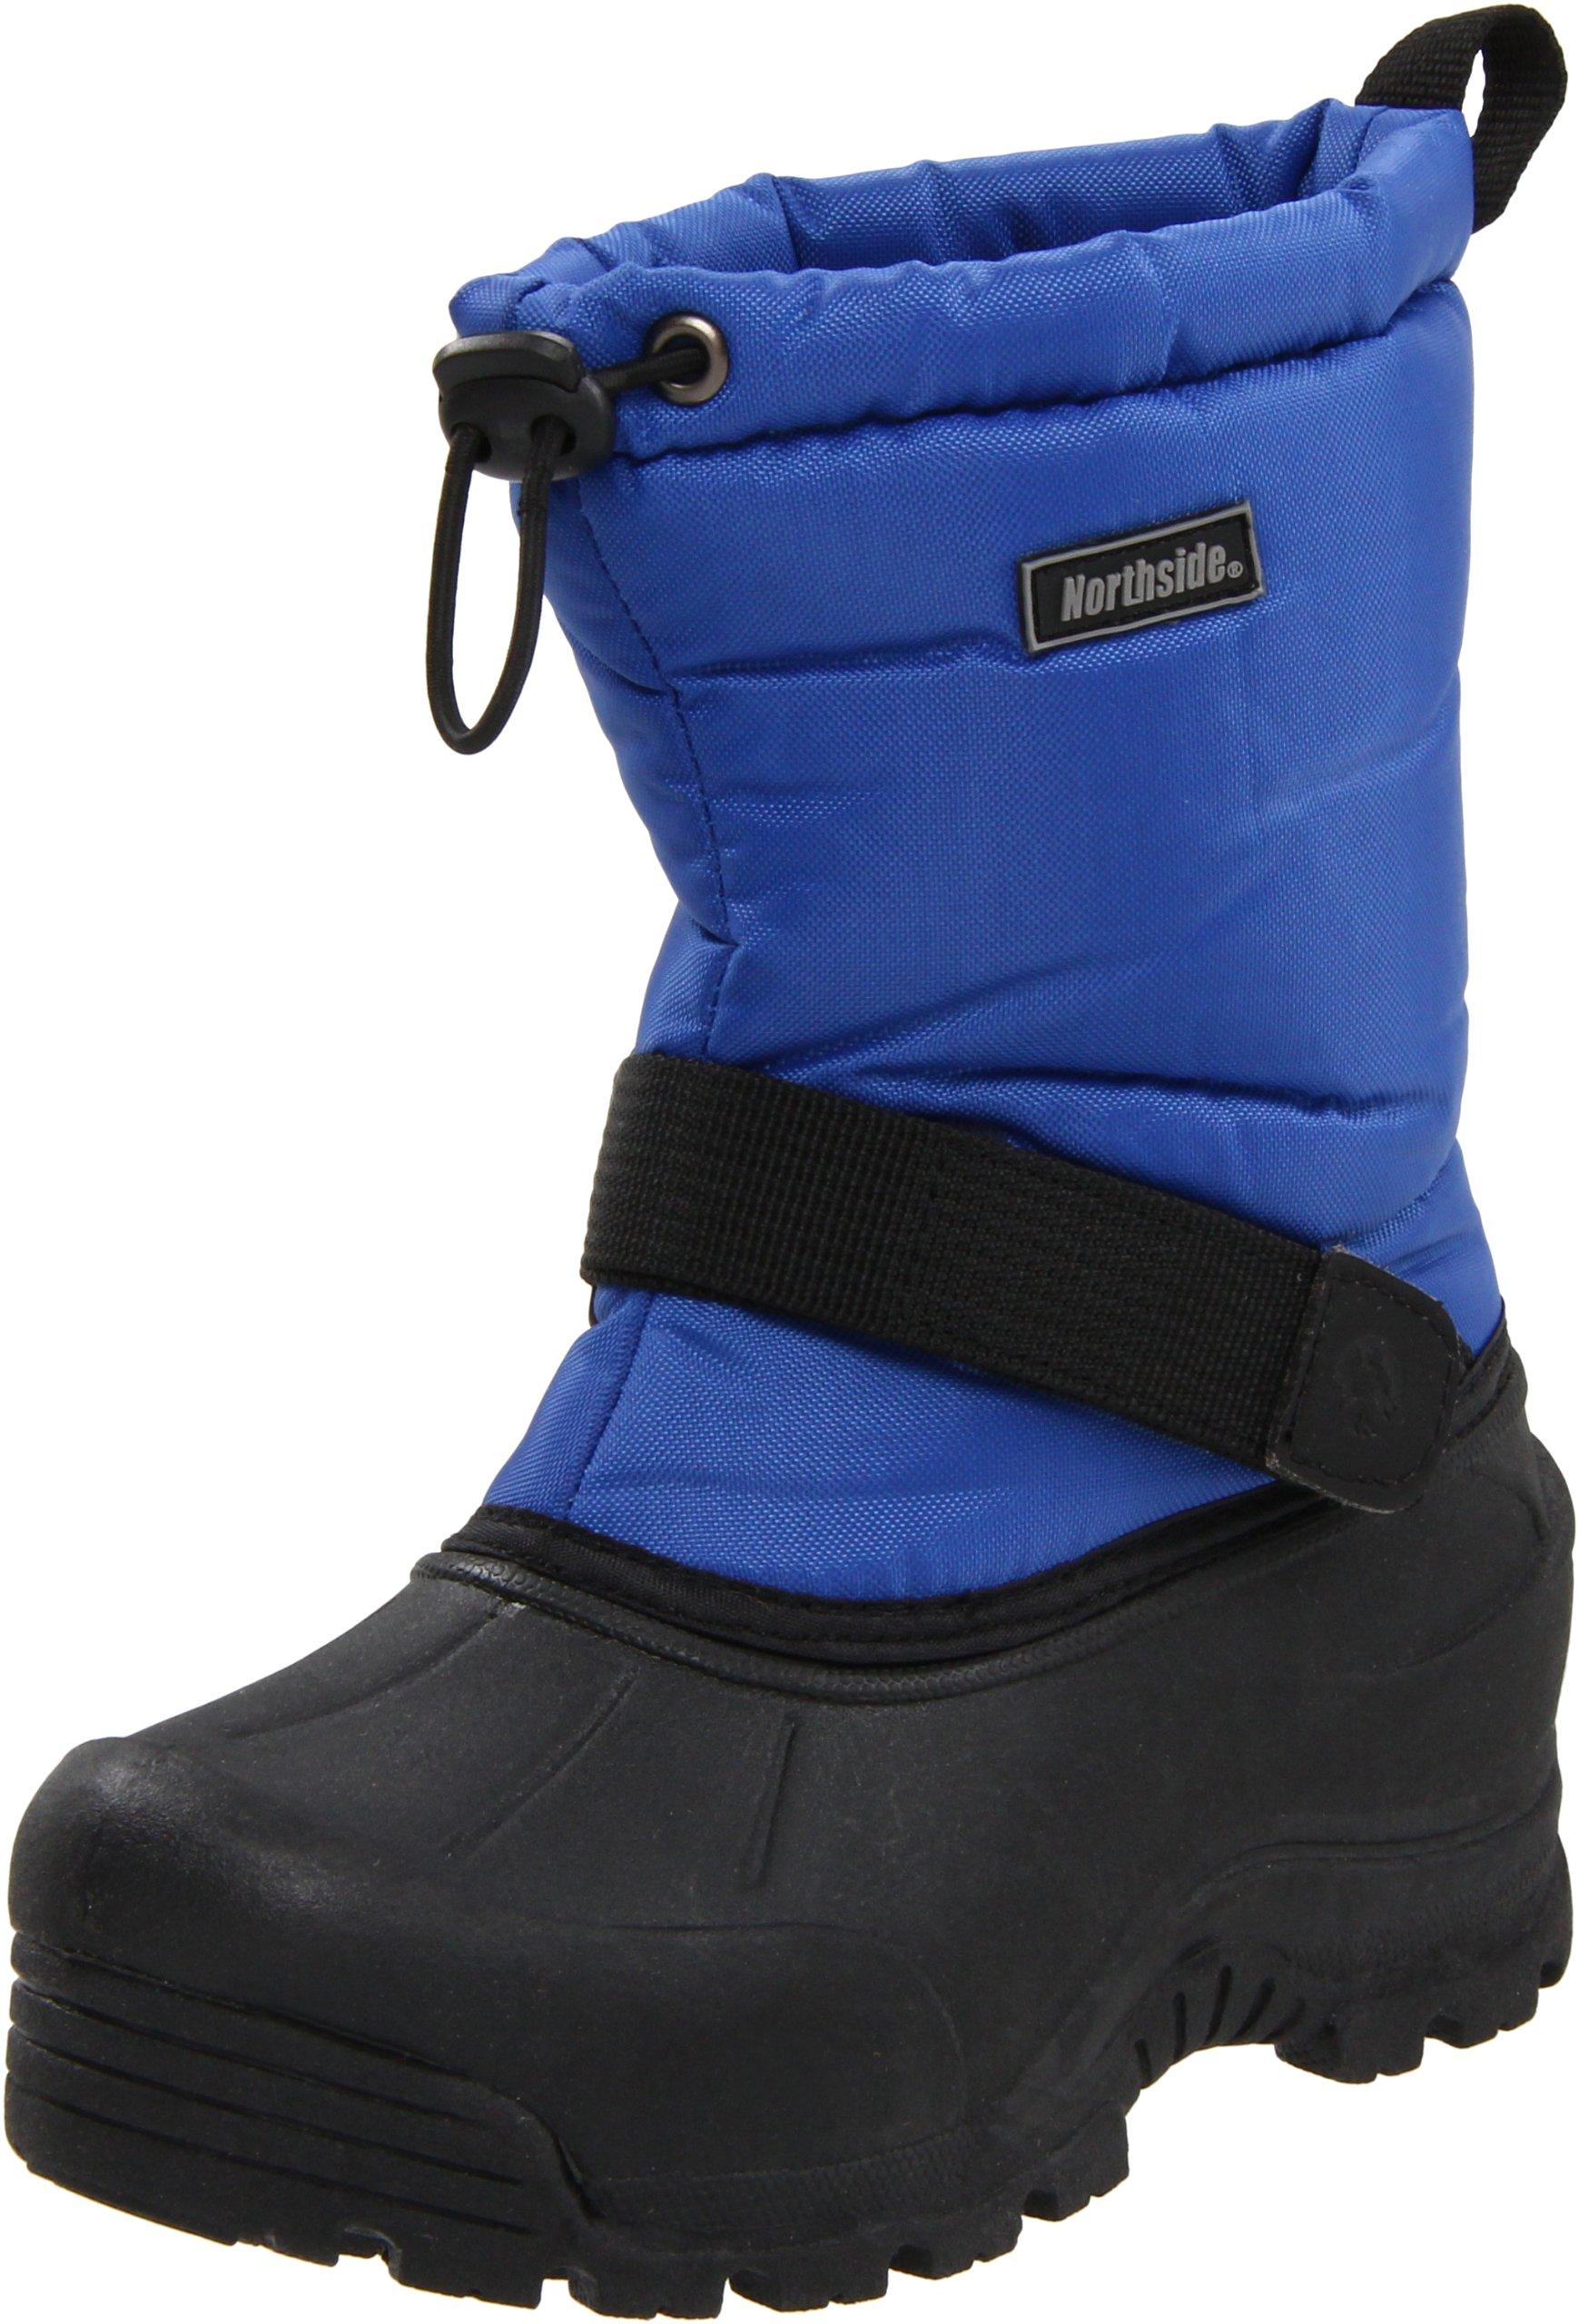 Northside Frosty Winter Boot (Toddler/Little Kid/Big Kid),Royal Blue,12 M US Little Kid